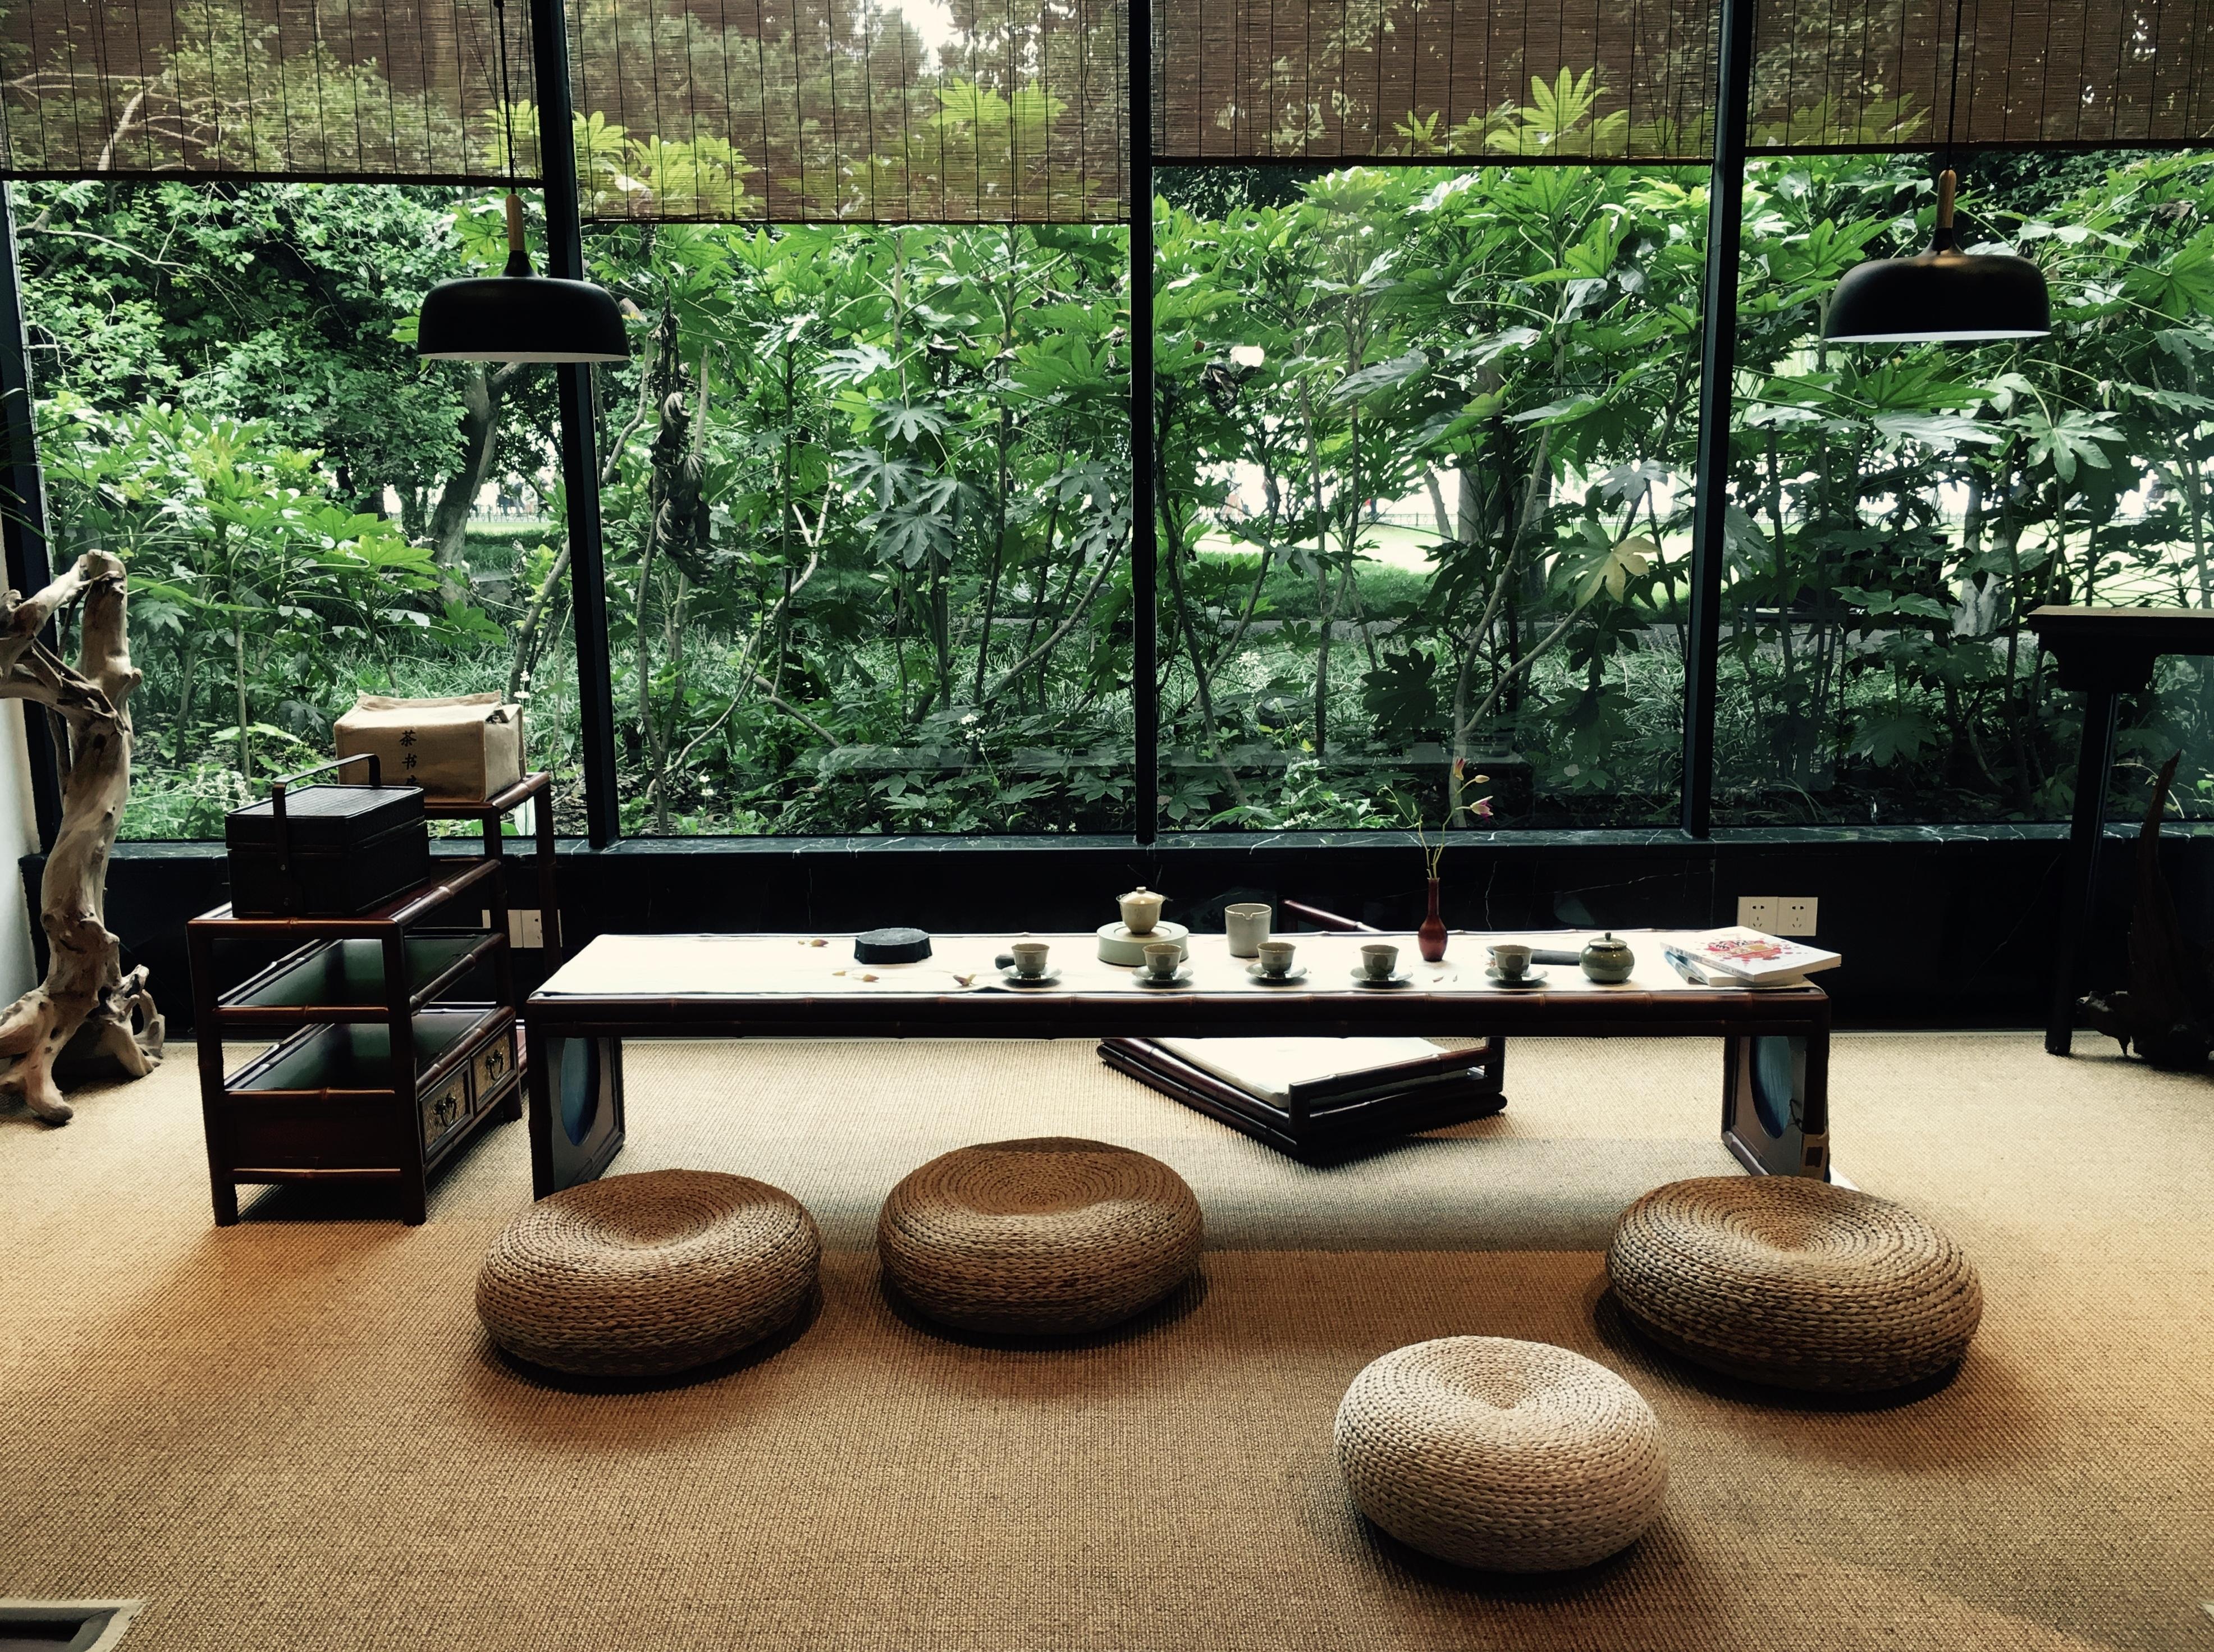 Table Photography Backyard Living Room Furniture Room Interior Design  Quaint Art Design Gallery Estate Antiquity Simple